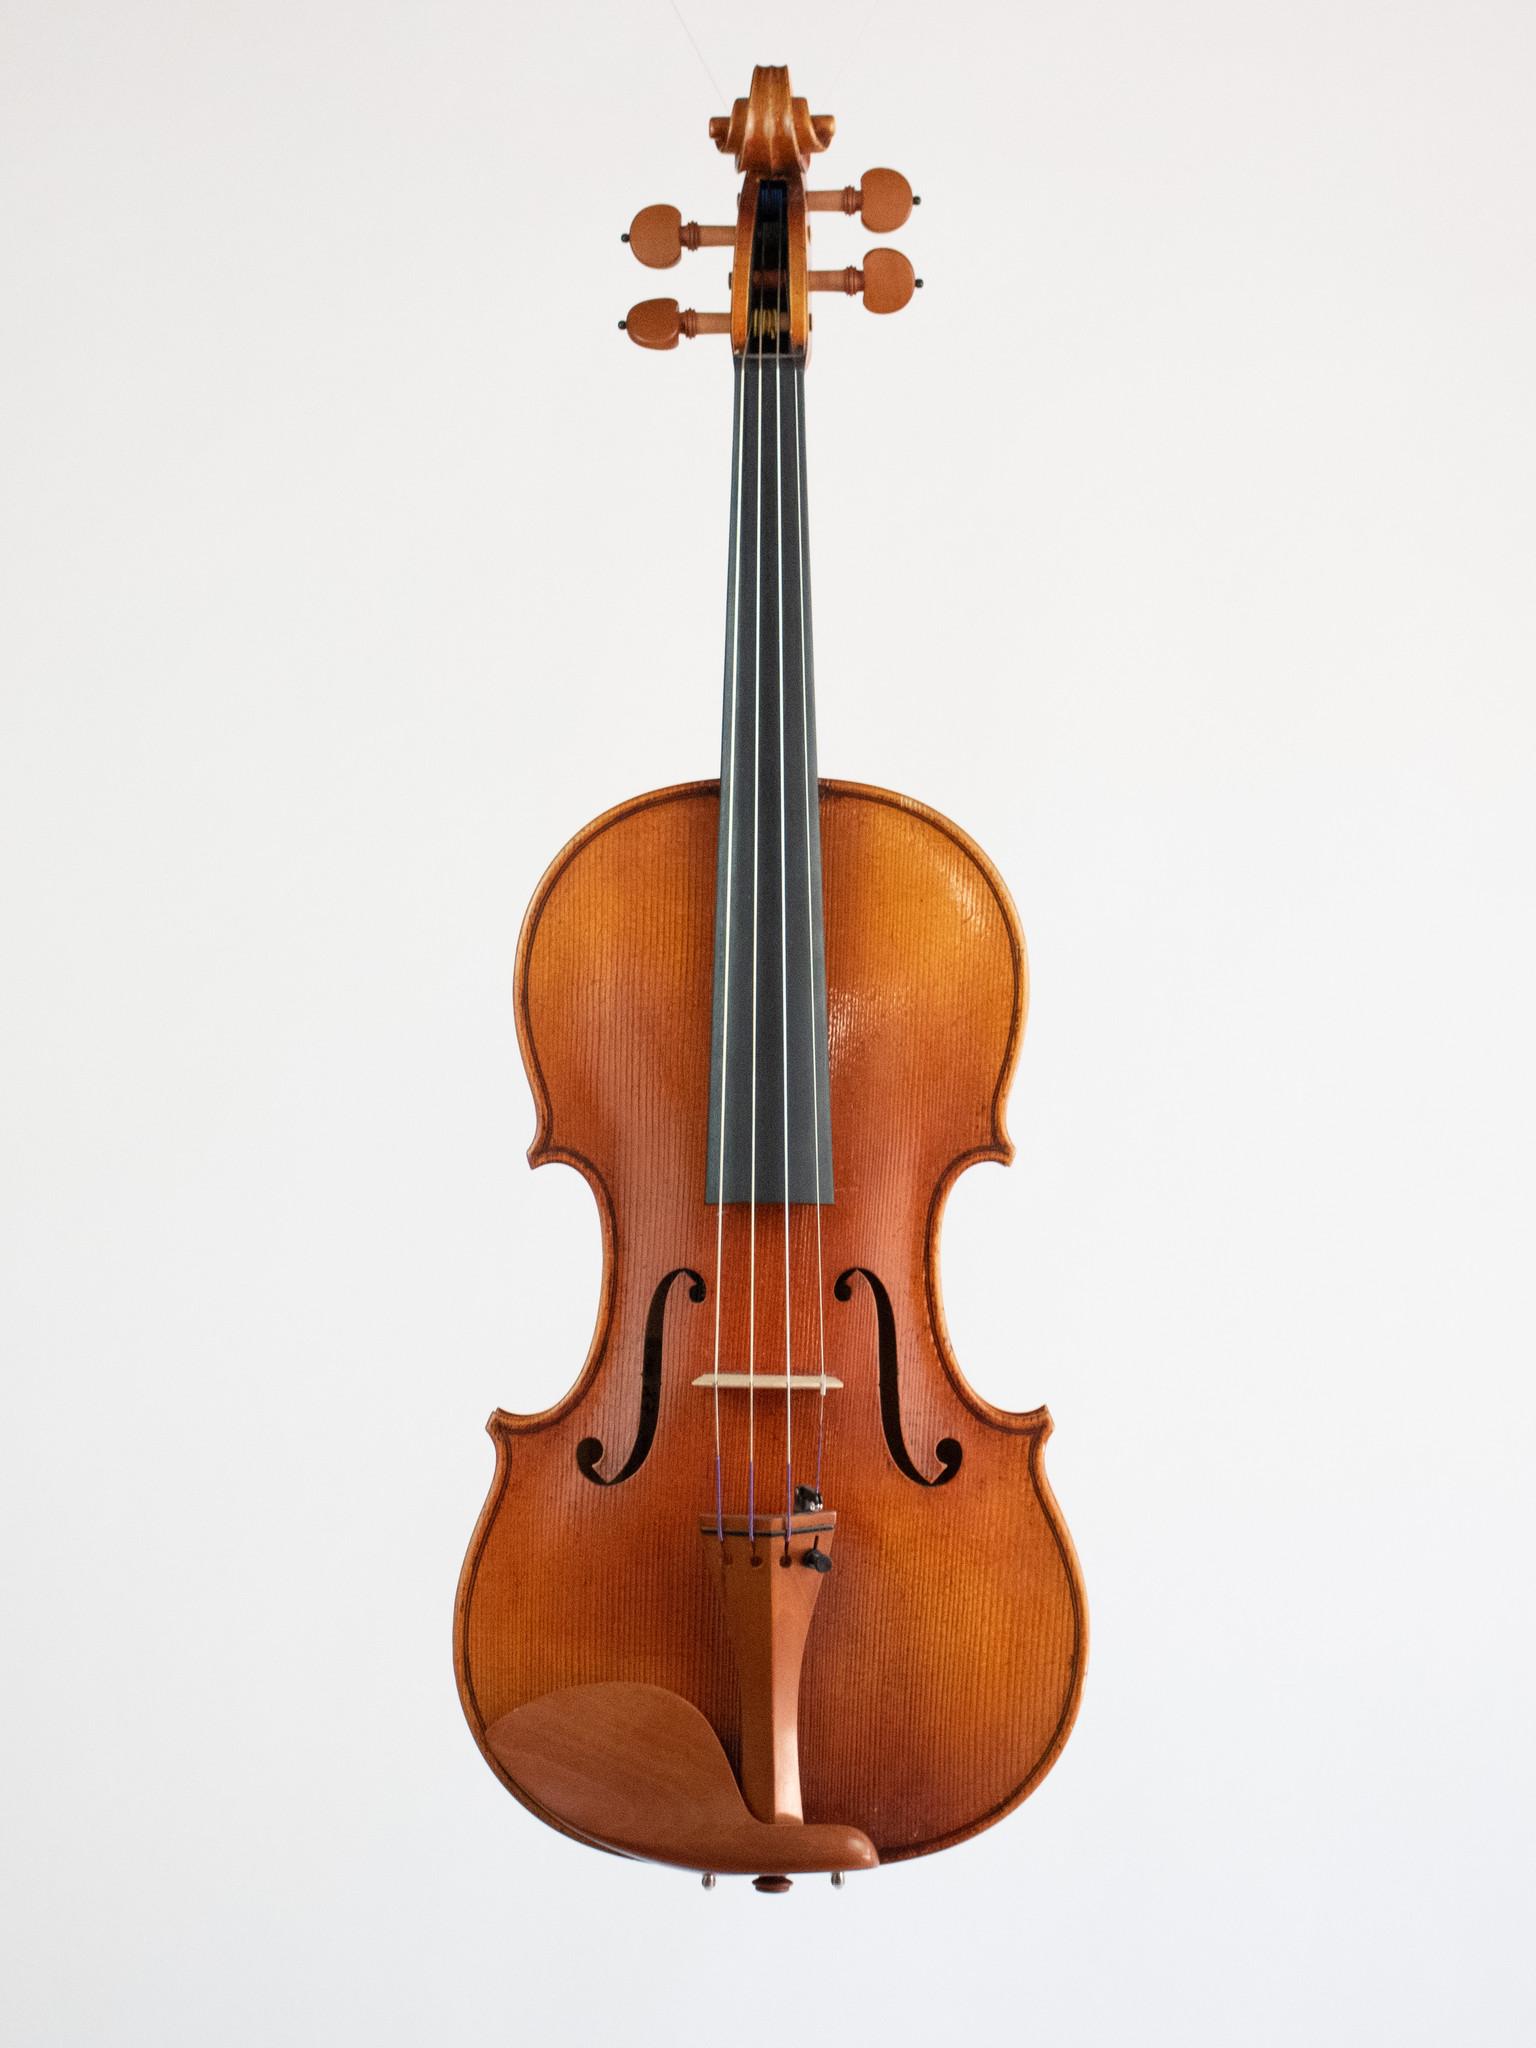 Heinrich Gill Heinrich Gill 4/4 violin, model No. X7, Bubenreuth, Germany 2014